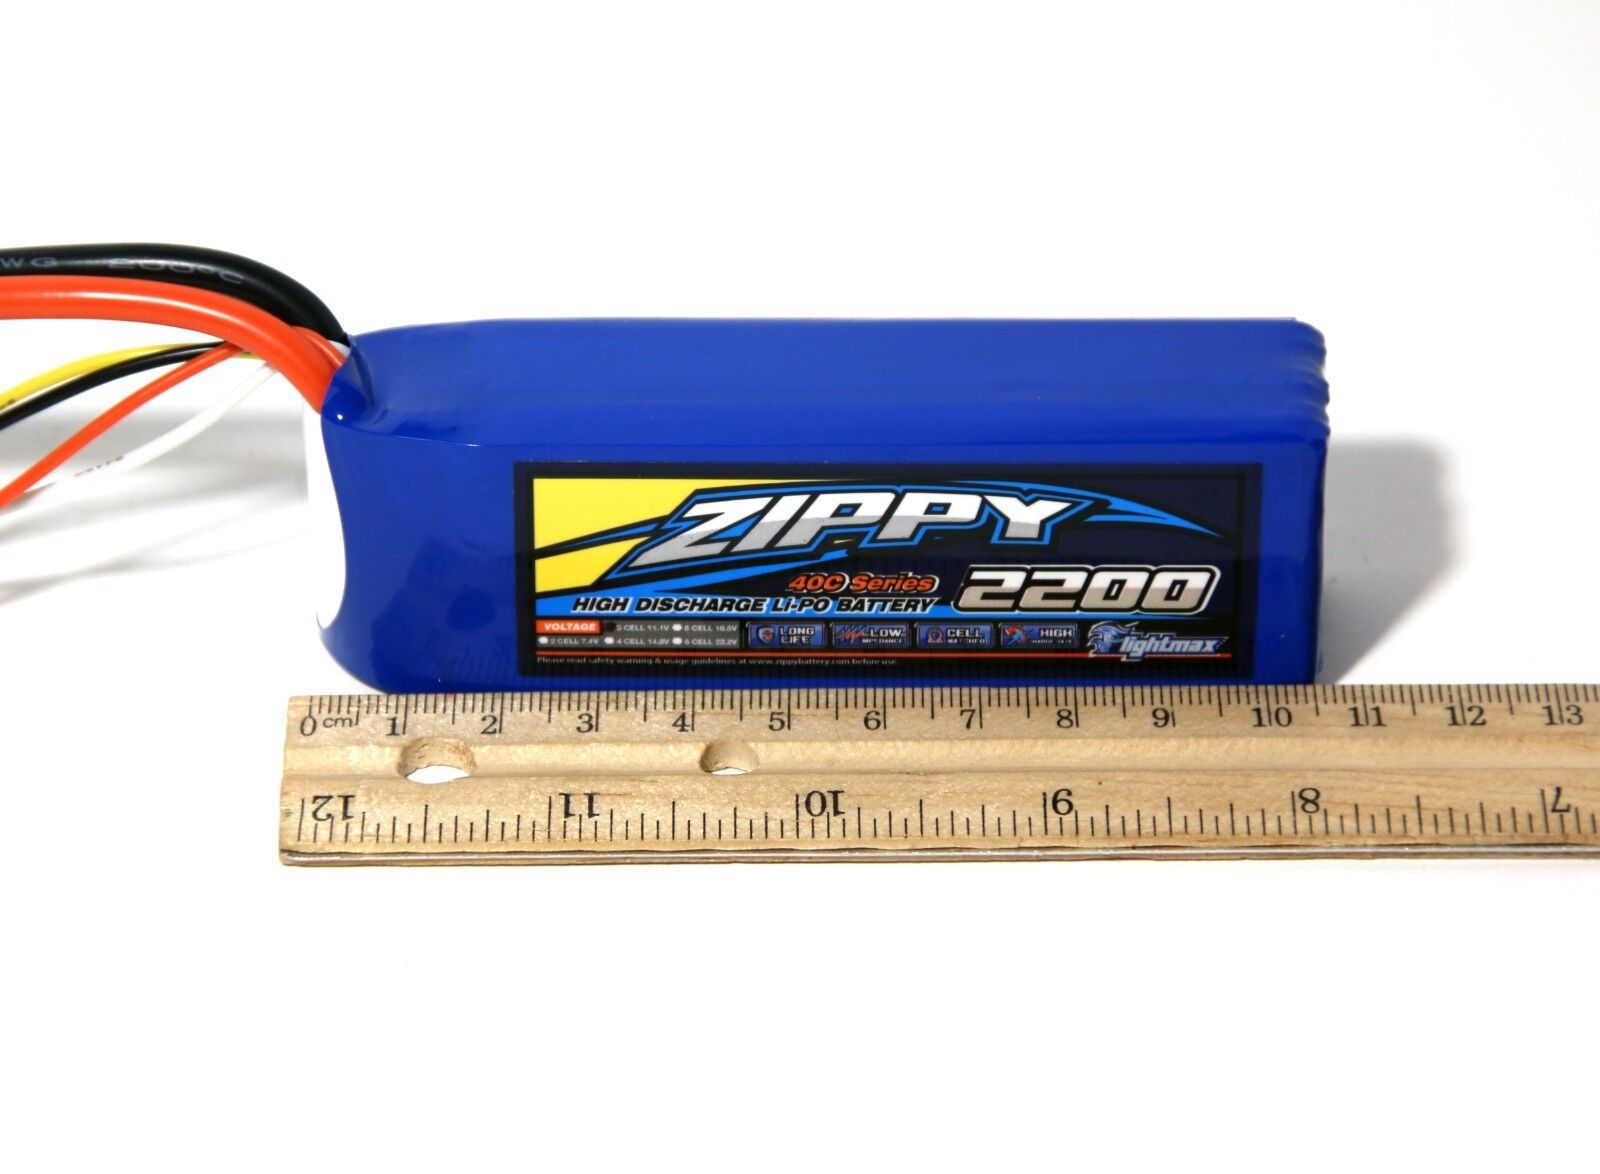 Zippy Flightmax 2200mAh 3S 11.V 40C Lipo Battery TRAXXAS XT6